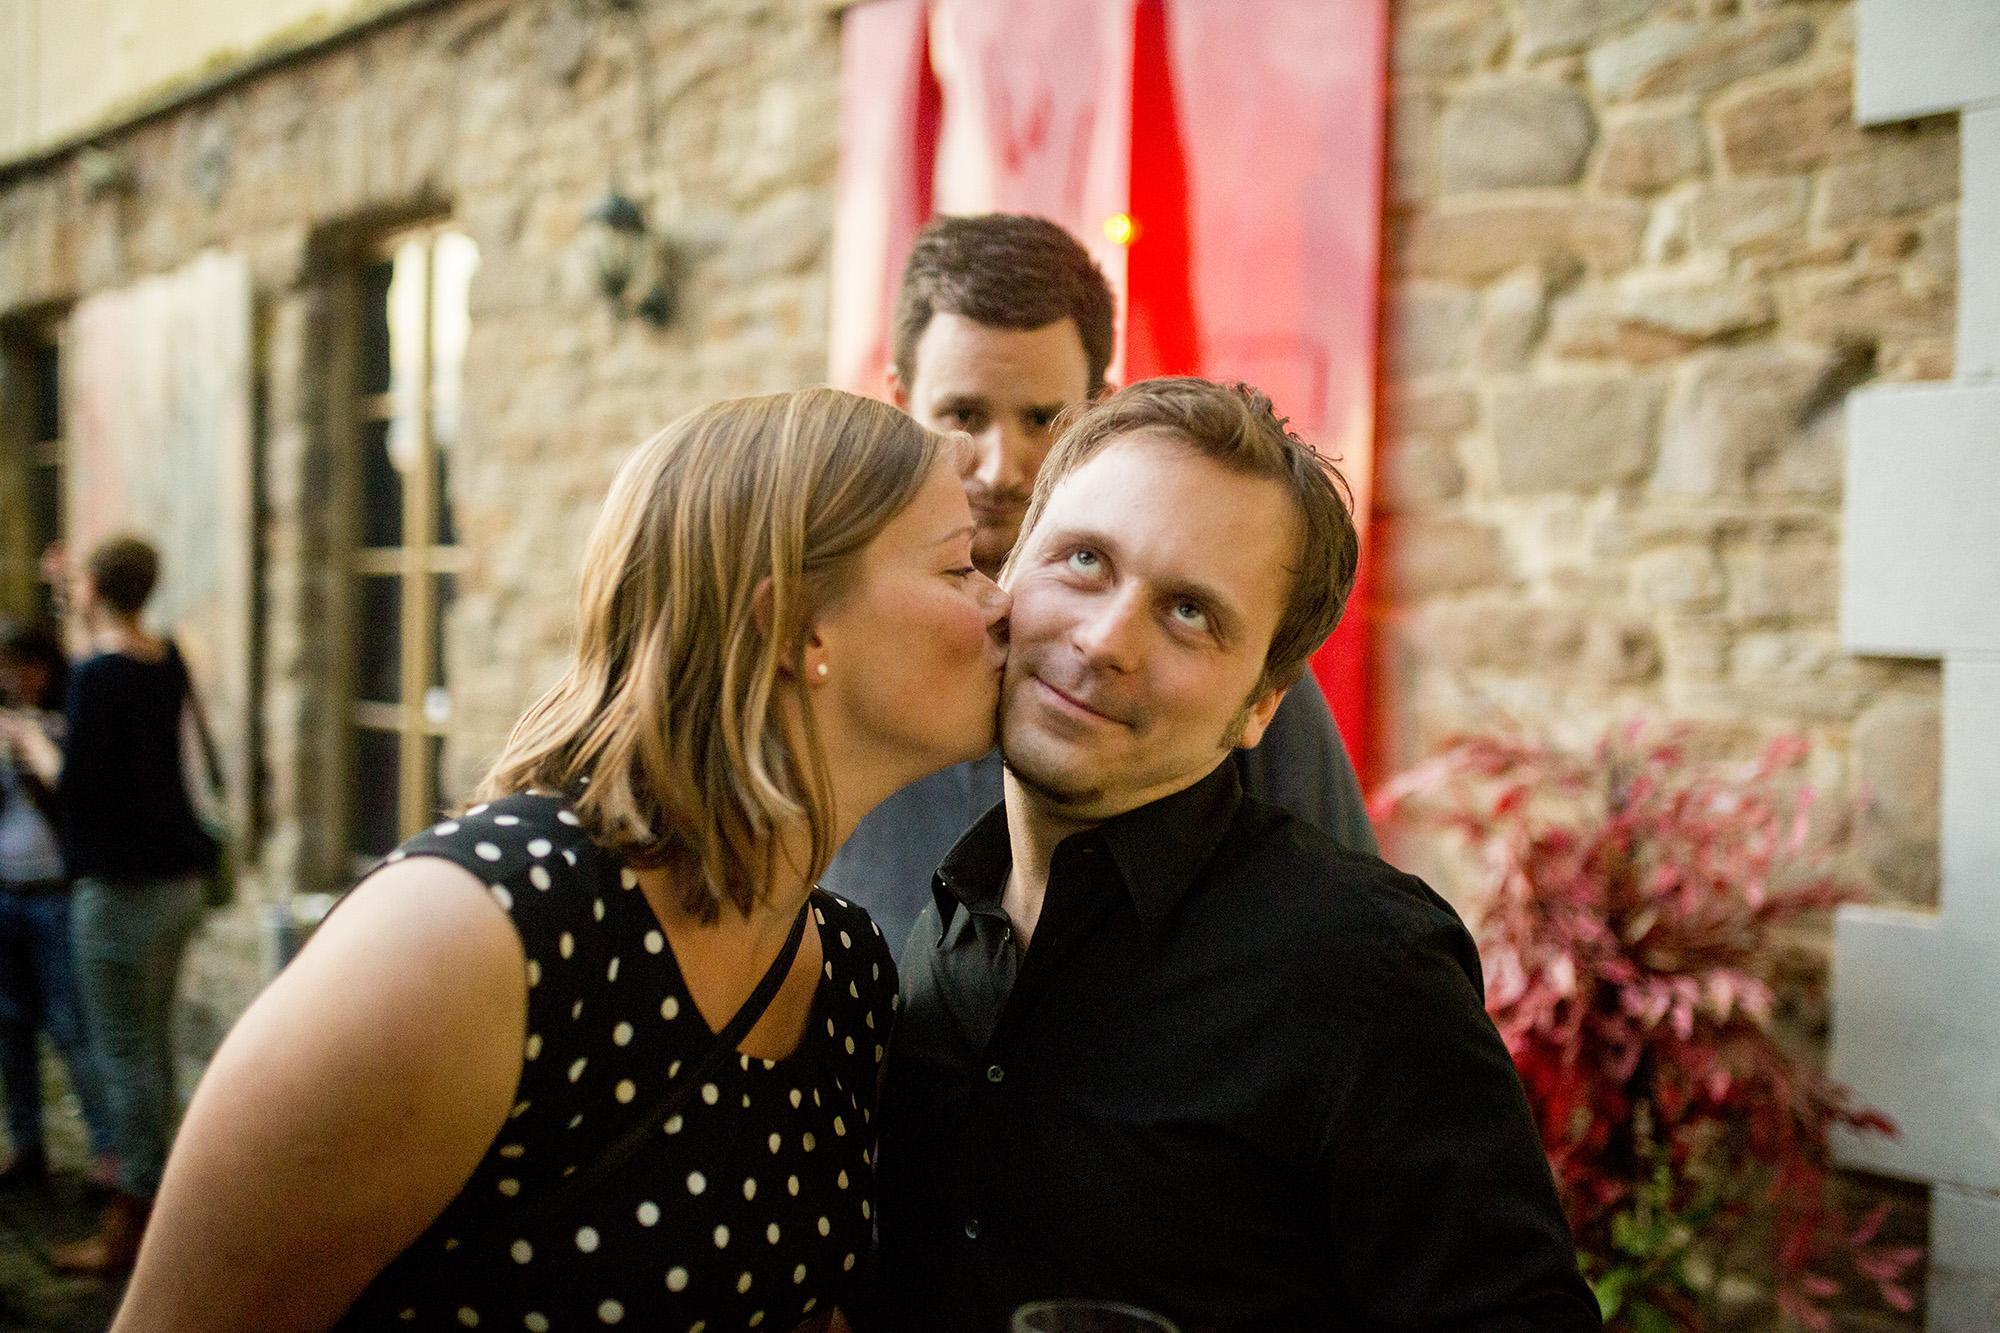 Seriously_Sabrina_Photography_Essen_Germany_RocknRoll_Hochzeit_Wedding_PatrickJenny143.jpg